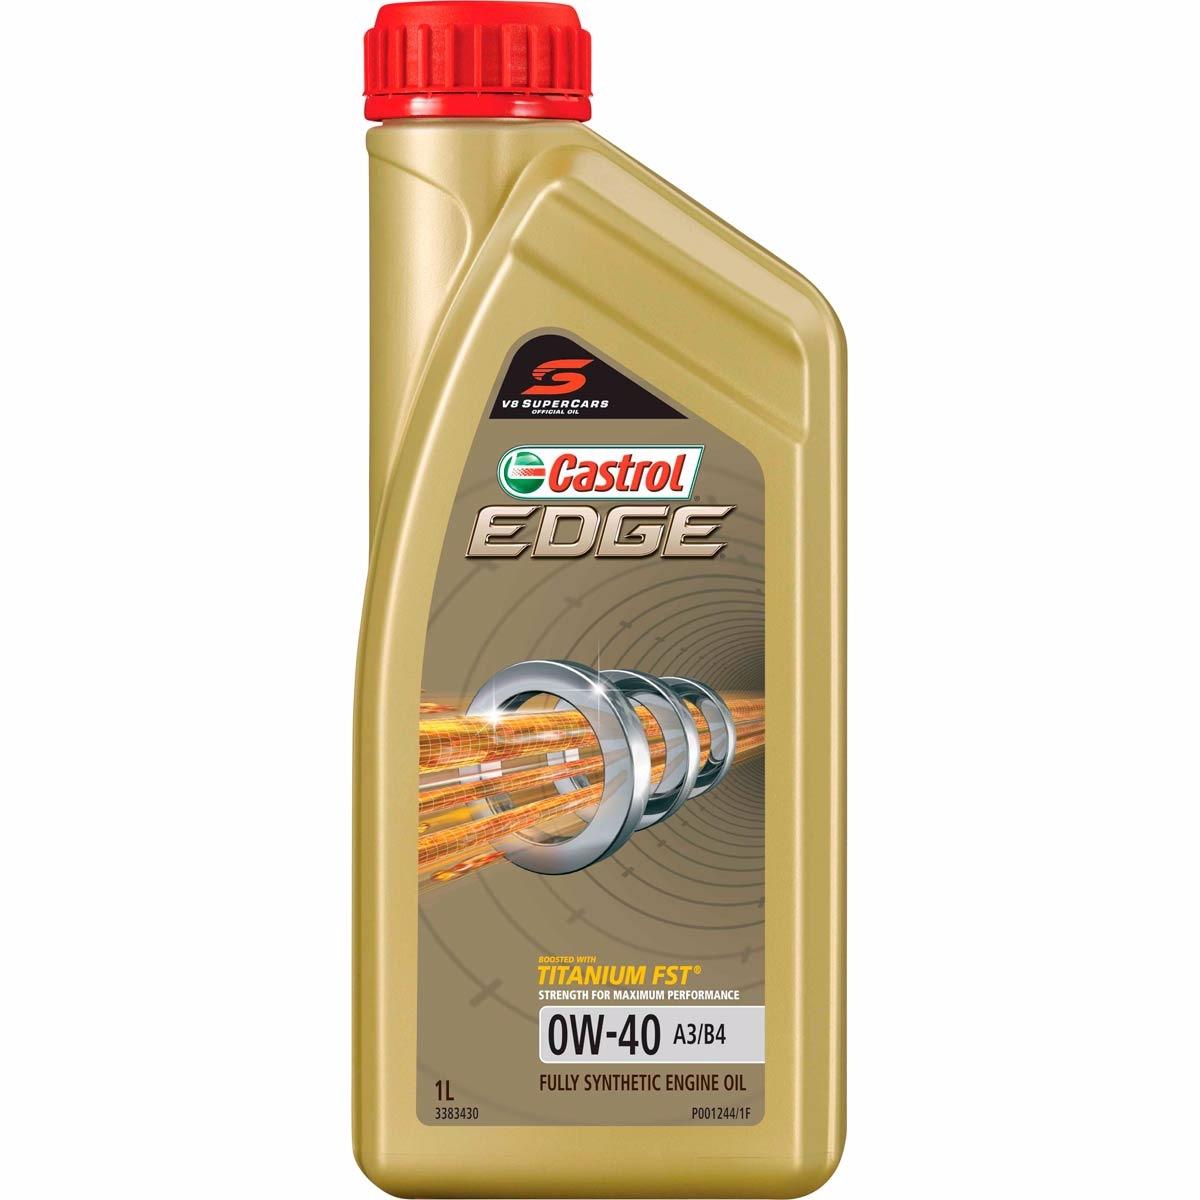 CASTROL Edge 0W40 1 liter (1845020)